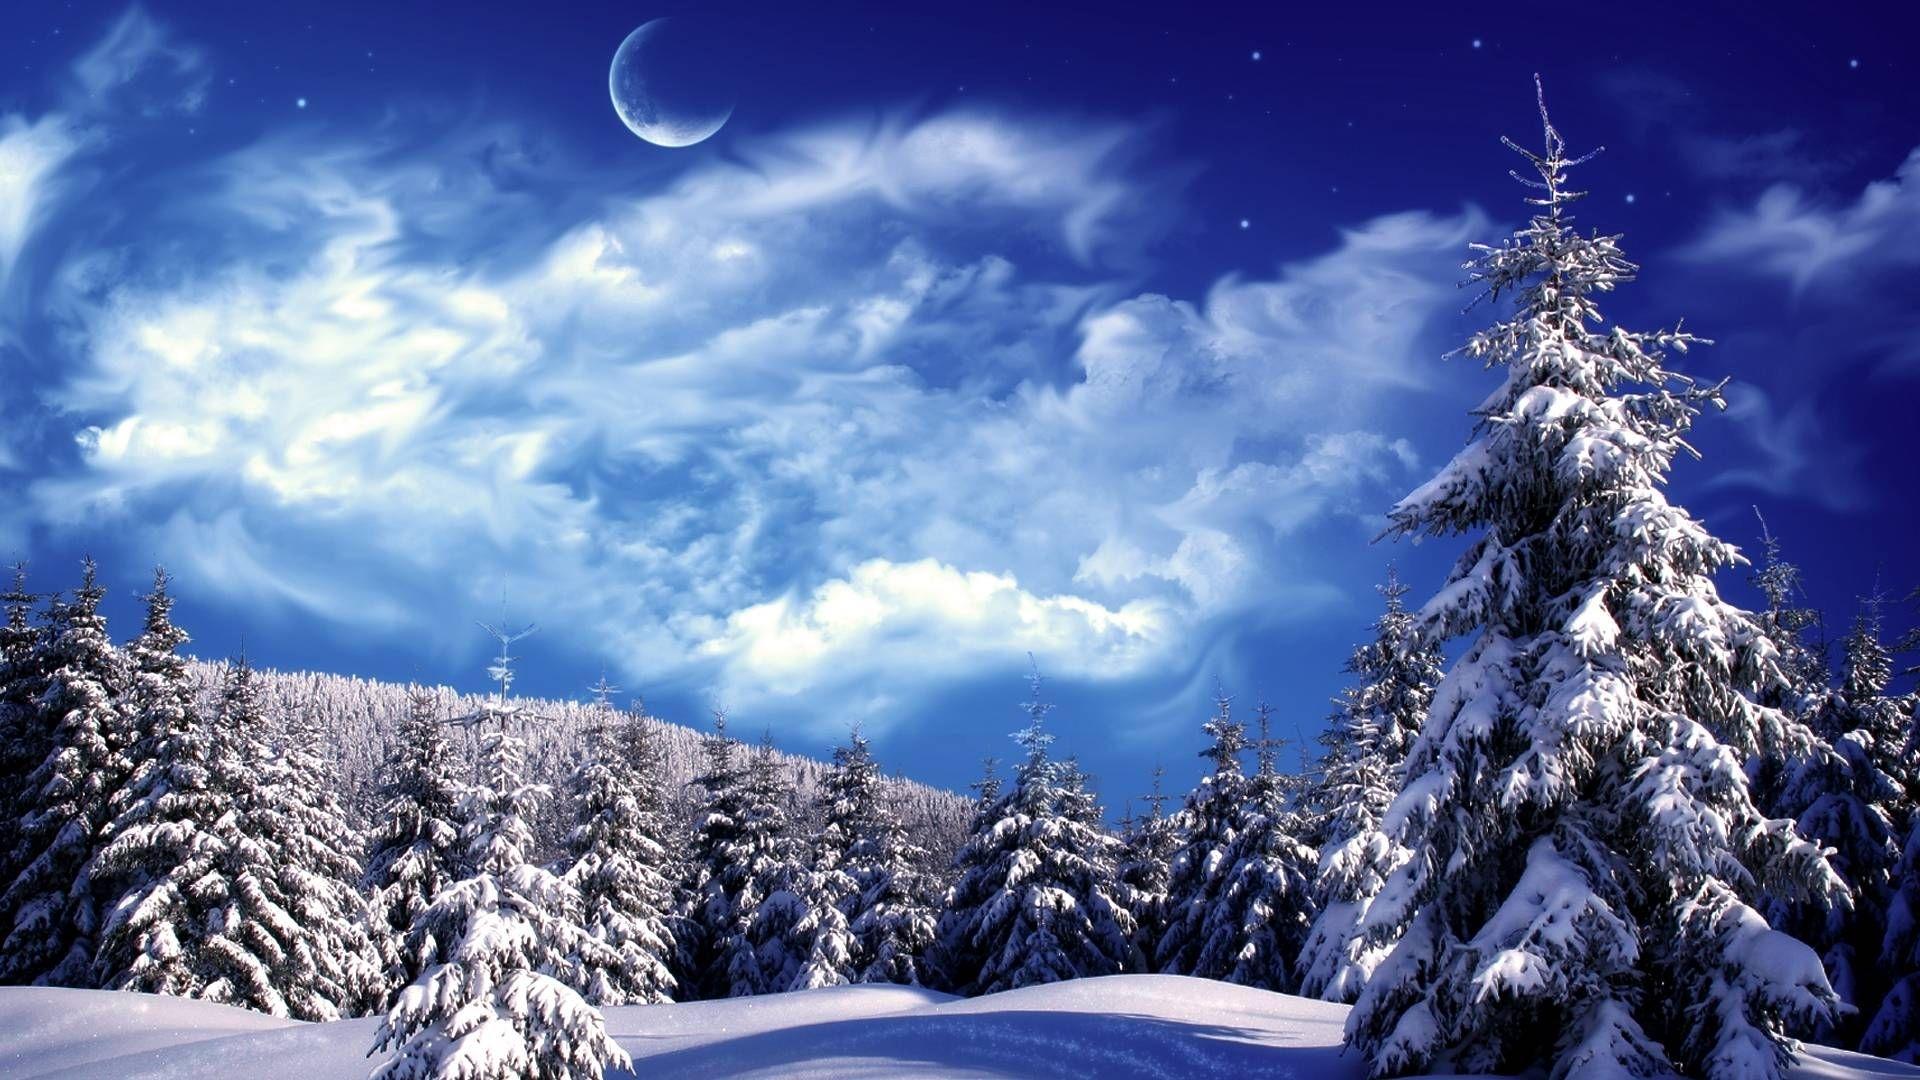 winter wonderland desktop backgrounds wallpaper | wonderland